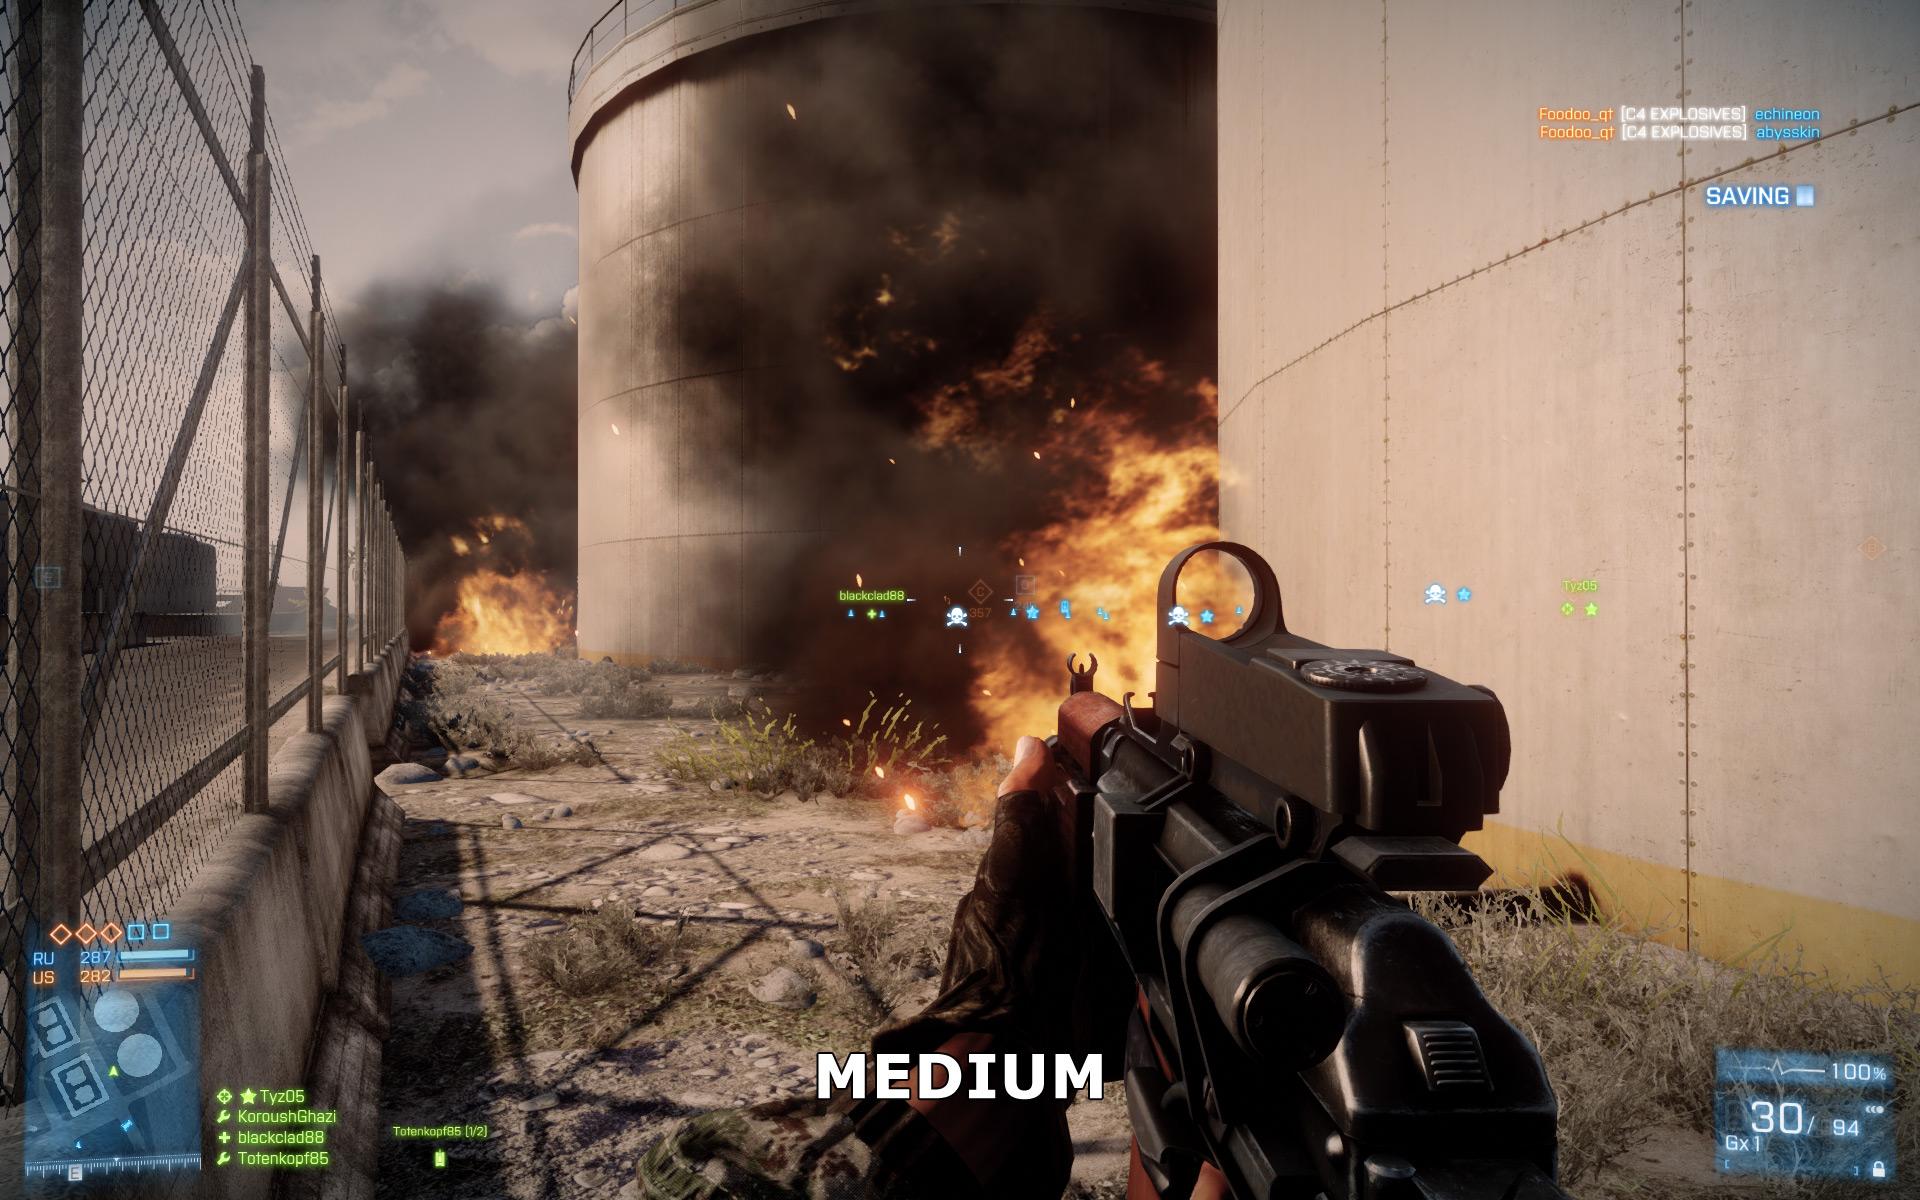 battlefield 3 tweak guide geforce rh geforce com Battlefield 1 Battlefield 5